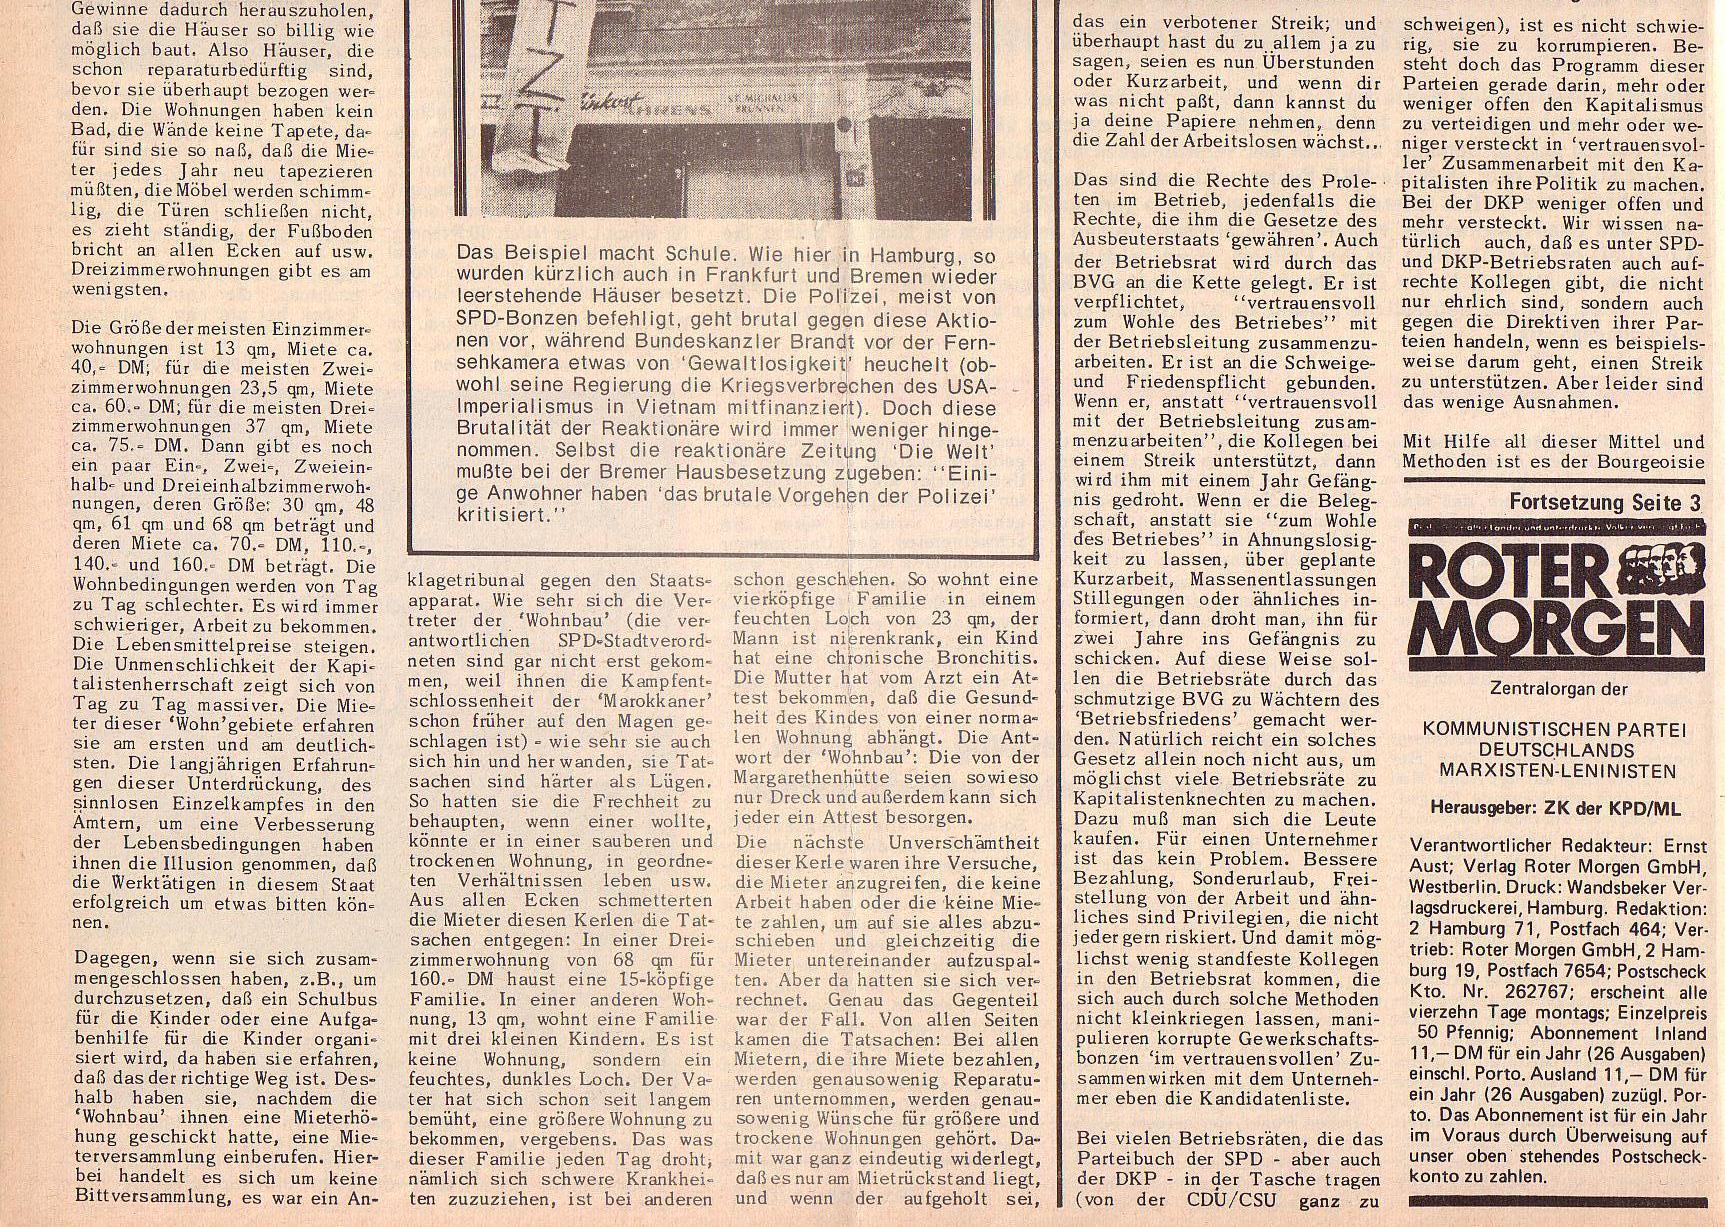 Roter Morgen, 6. Jg., 28. Februar 1972, Nr. 5, Seite 2b